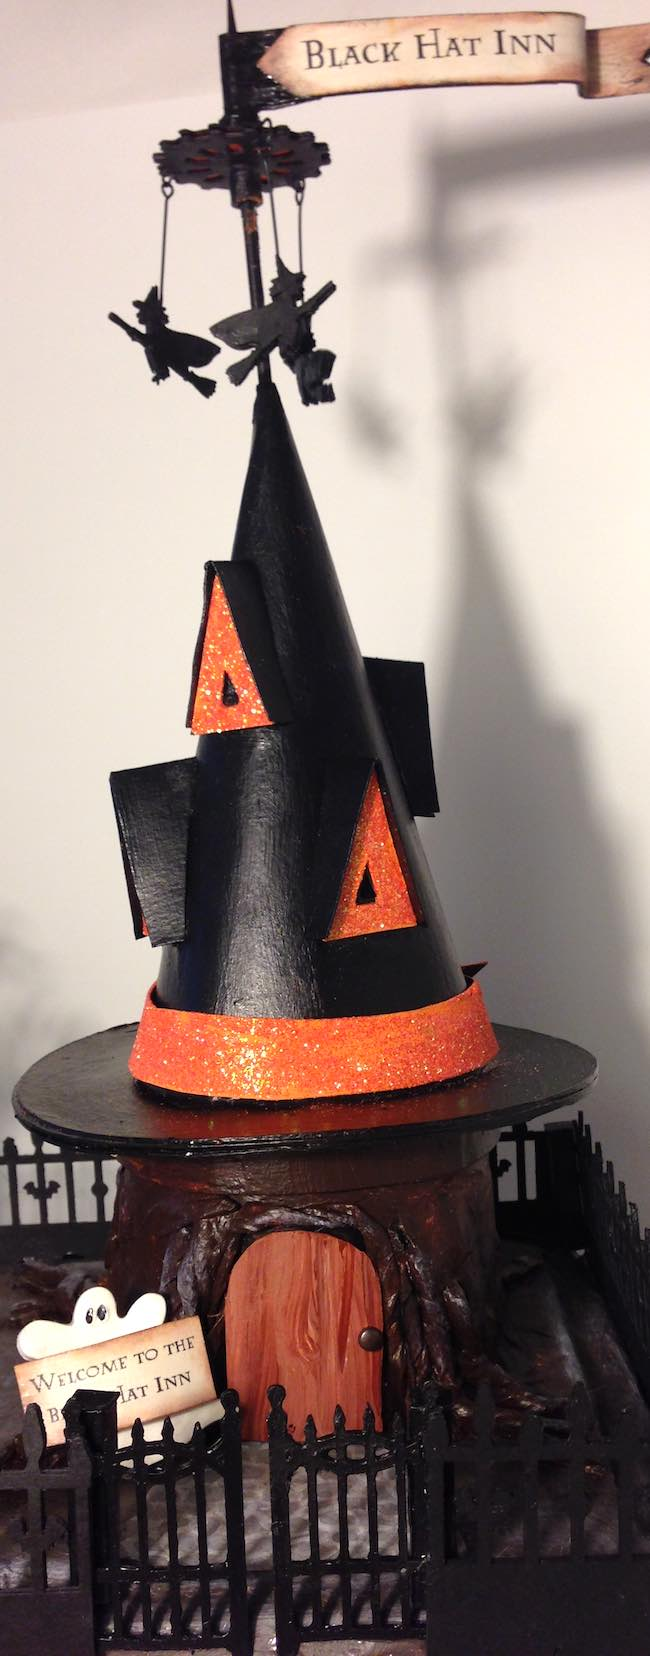 Welcome to the Black Hat Inn cardboard Halloween house